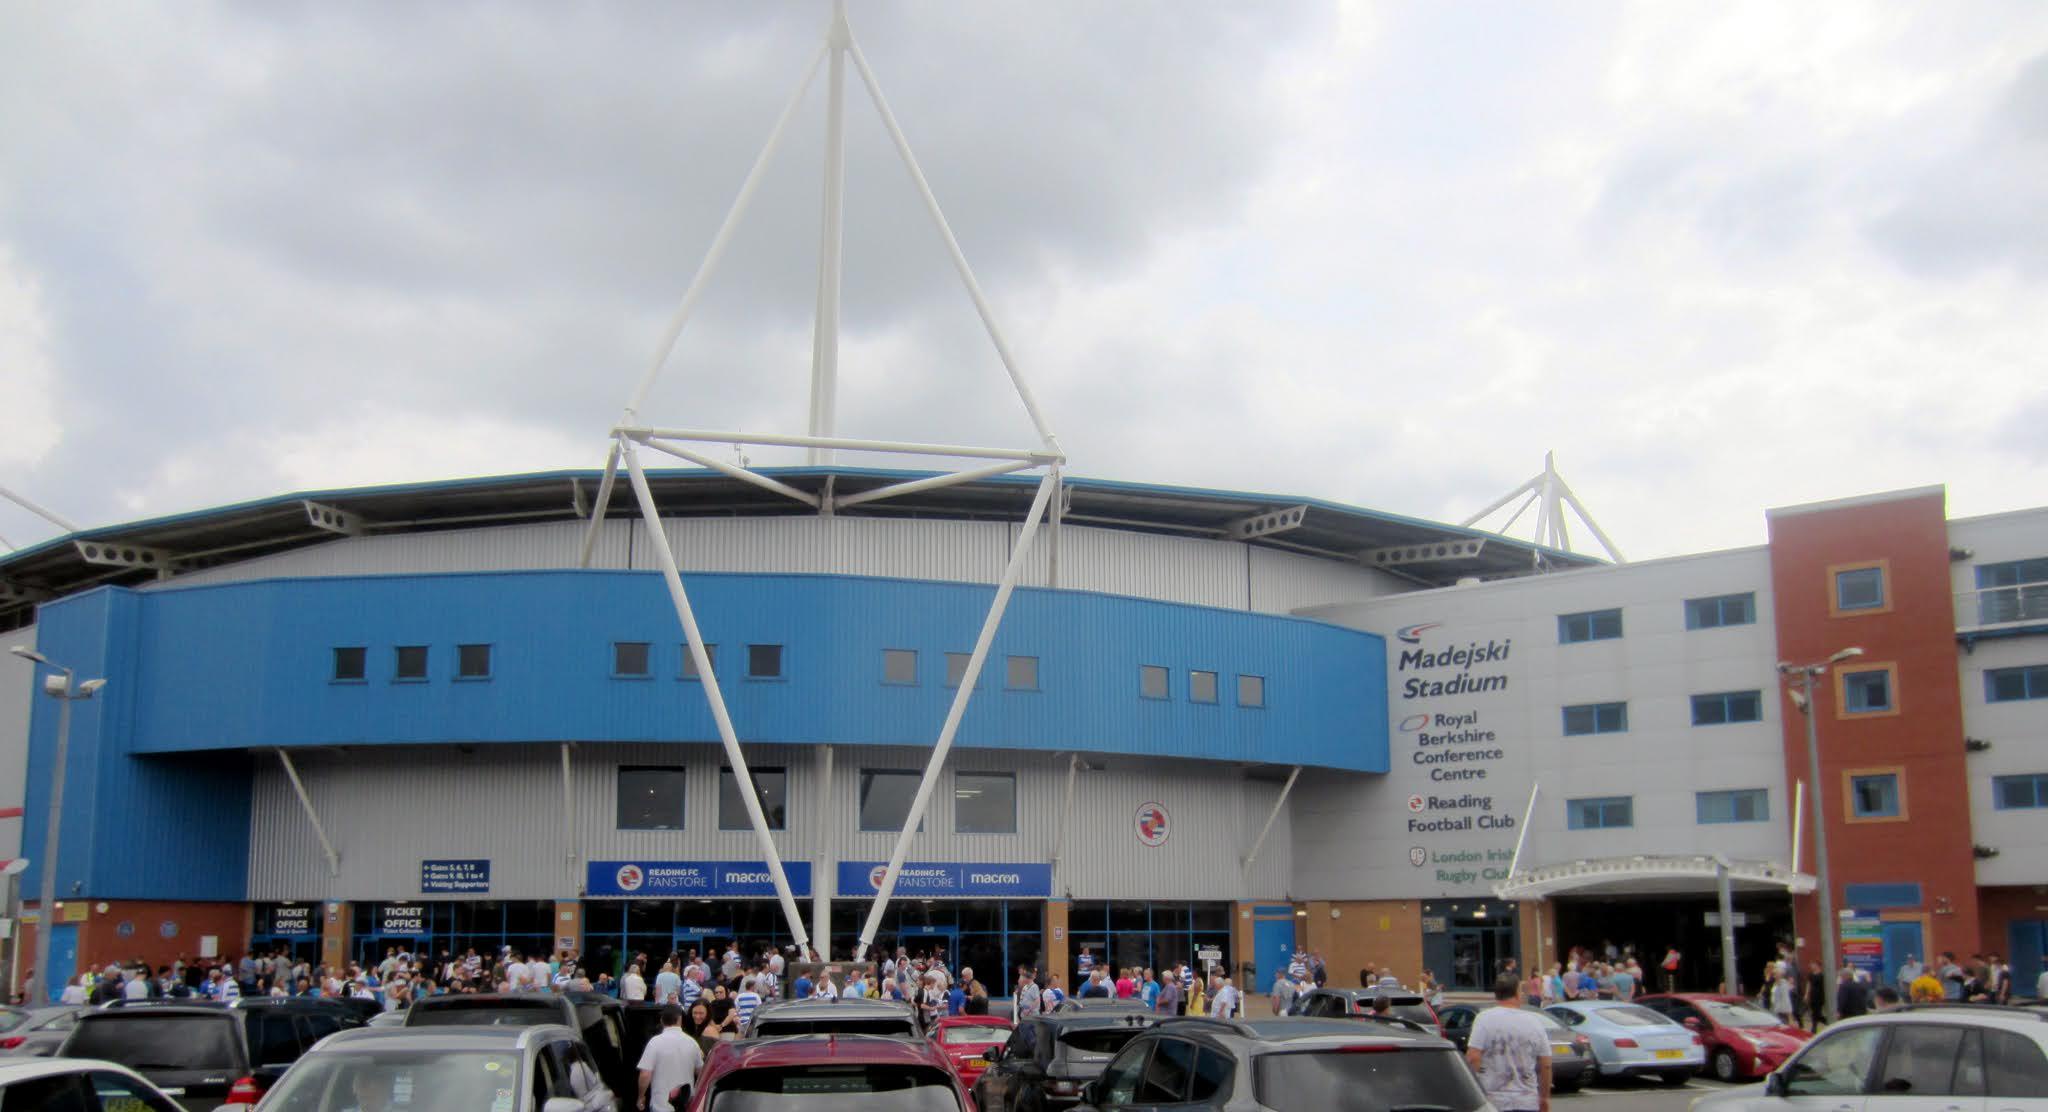 The Fanstore outside the Madejski Stadium